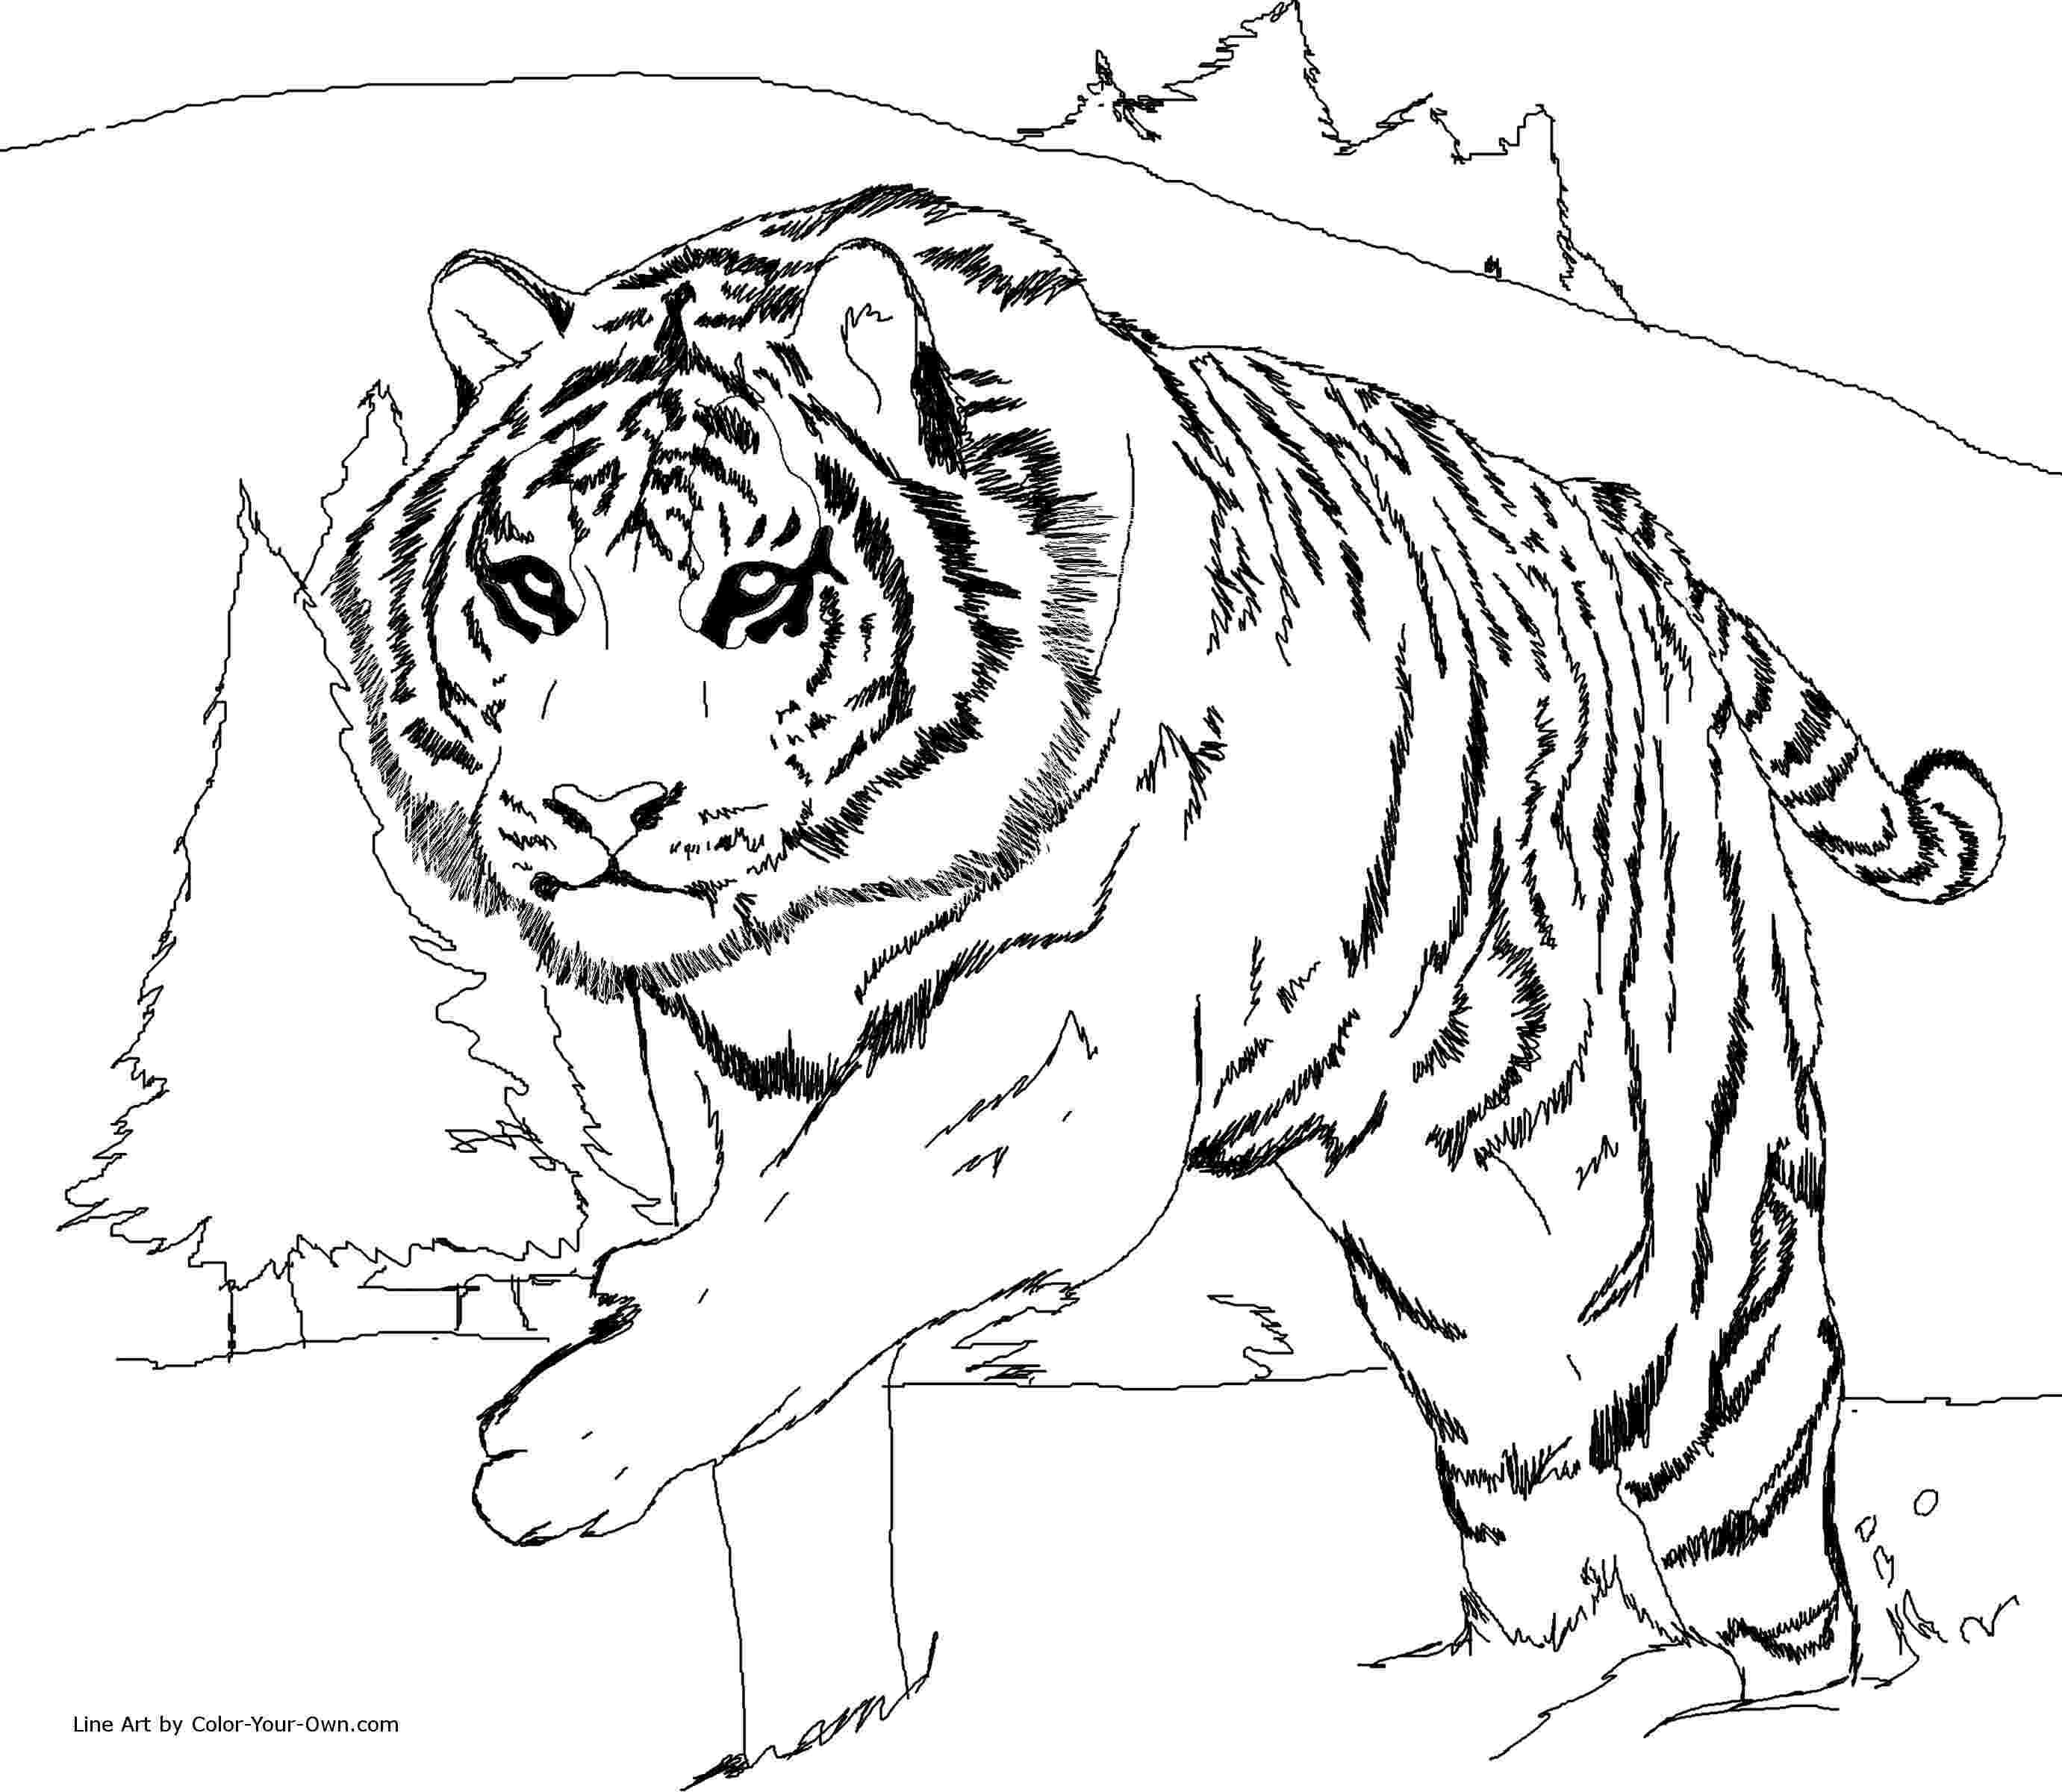 siberian tiger coloring page siberian or amur tiger coloring page free printable page coloring siberian tiger